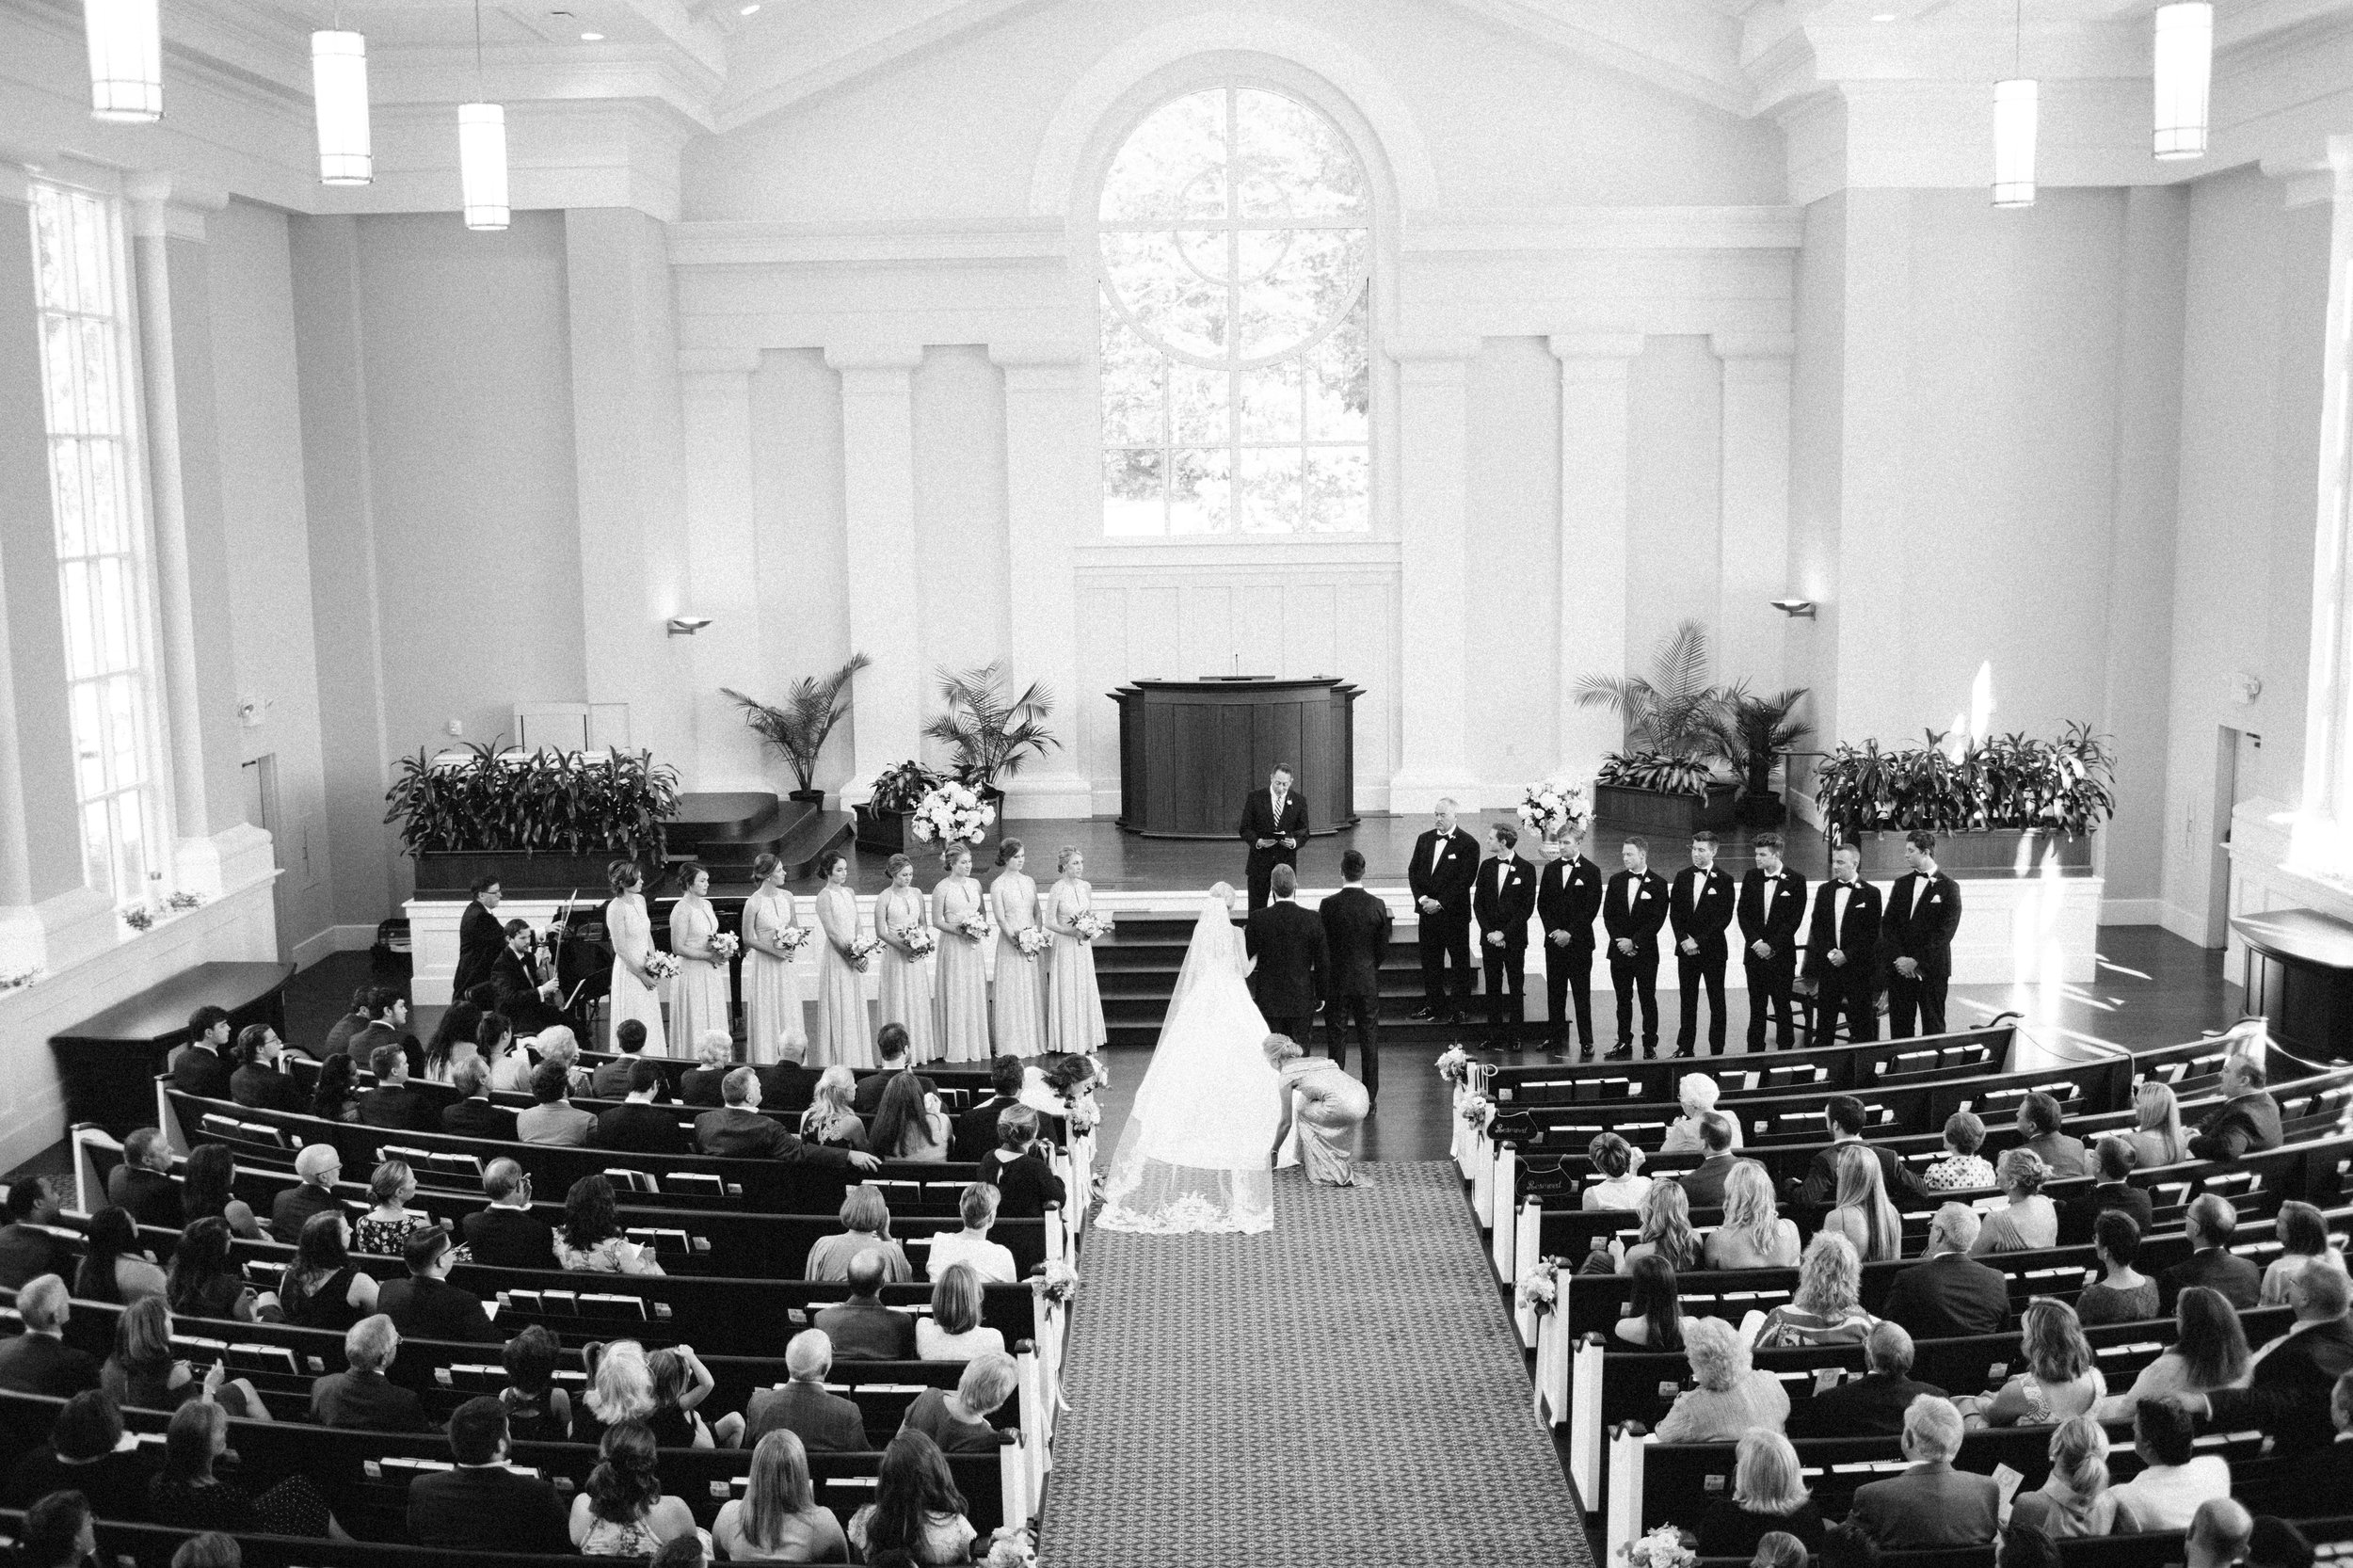 Marie_Perry_Duke_Mansion_Wedding_Charlotte_NC_Abigail_Malone_Photography-274.jpg